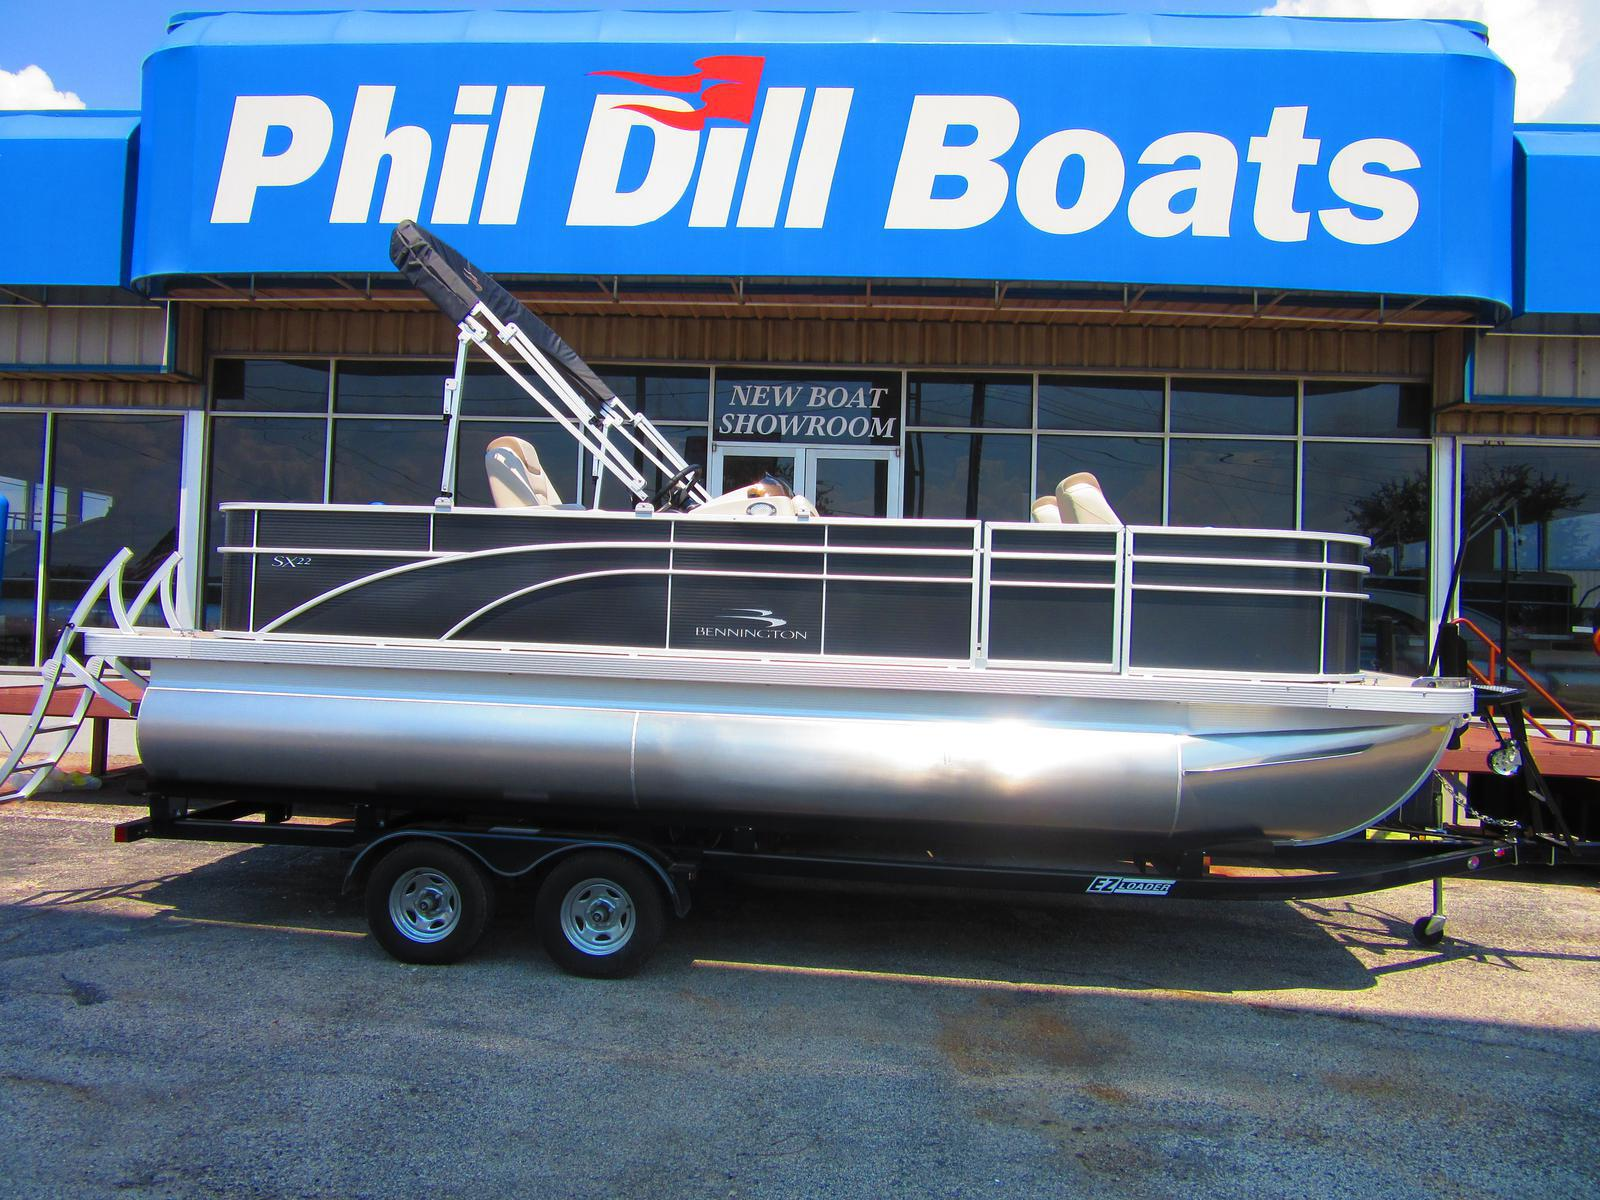 North dakota Deals Craigslist boats by Owner rentals